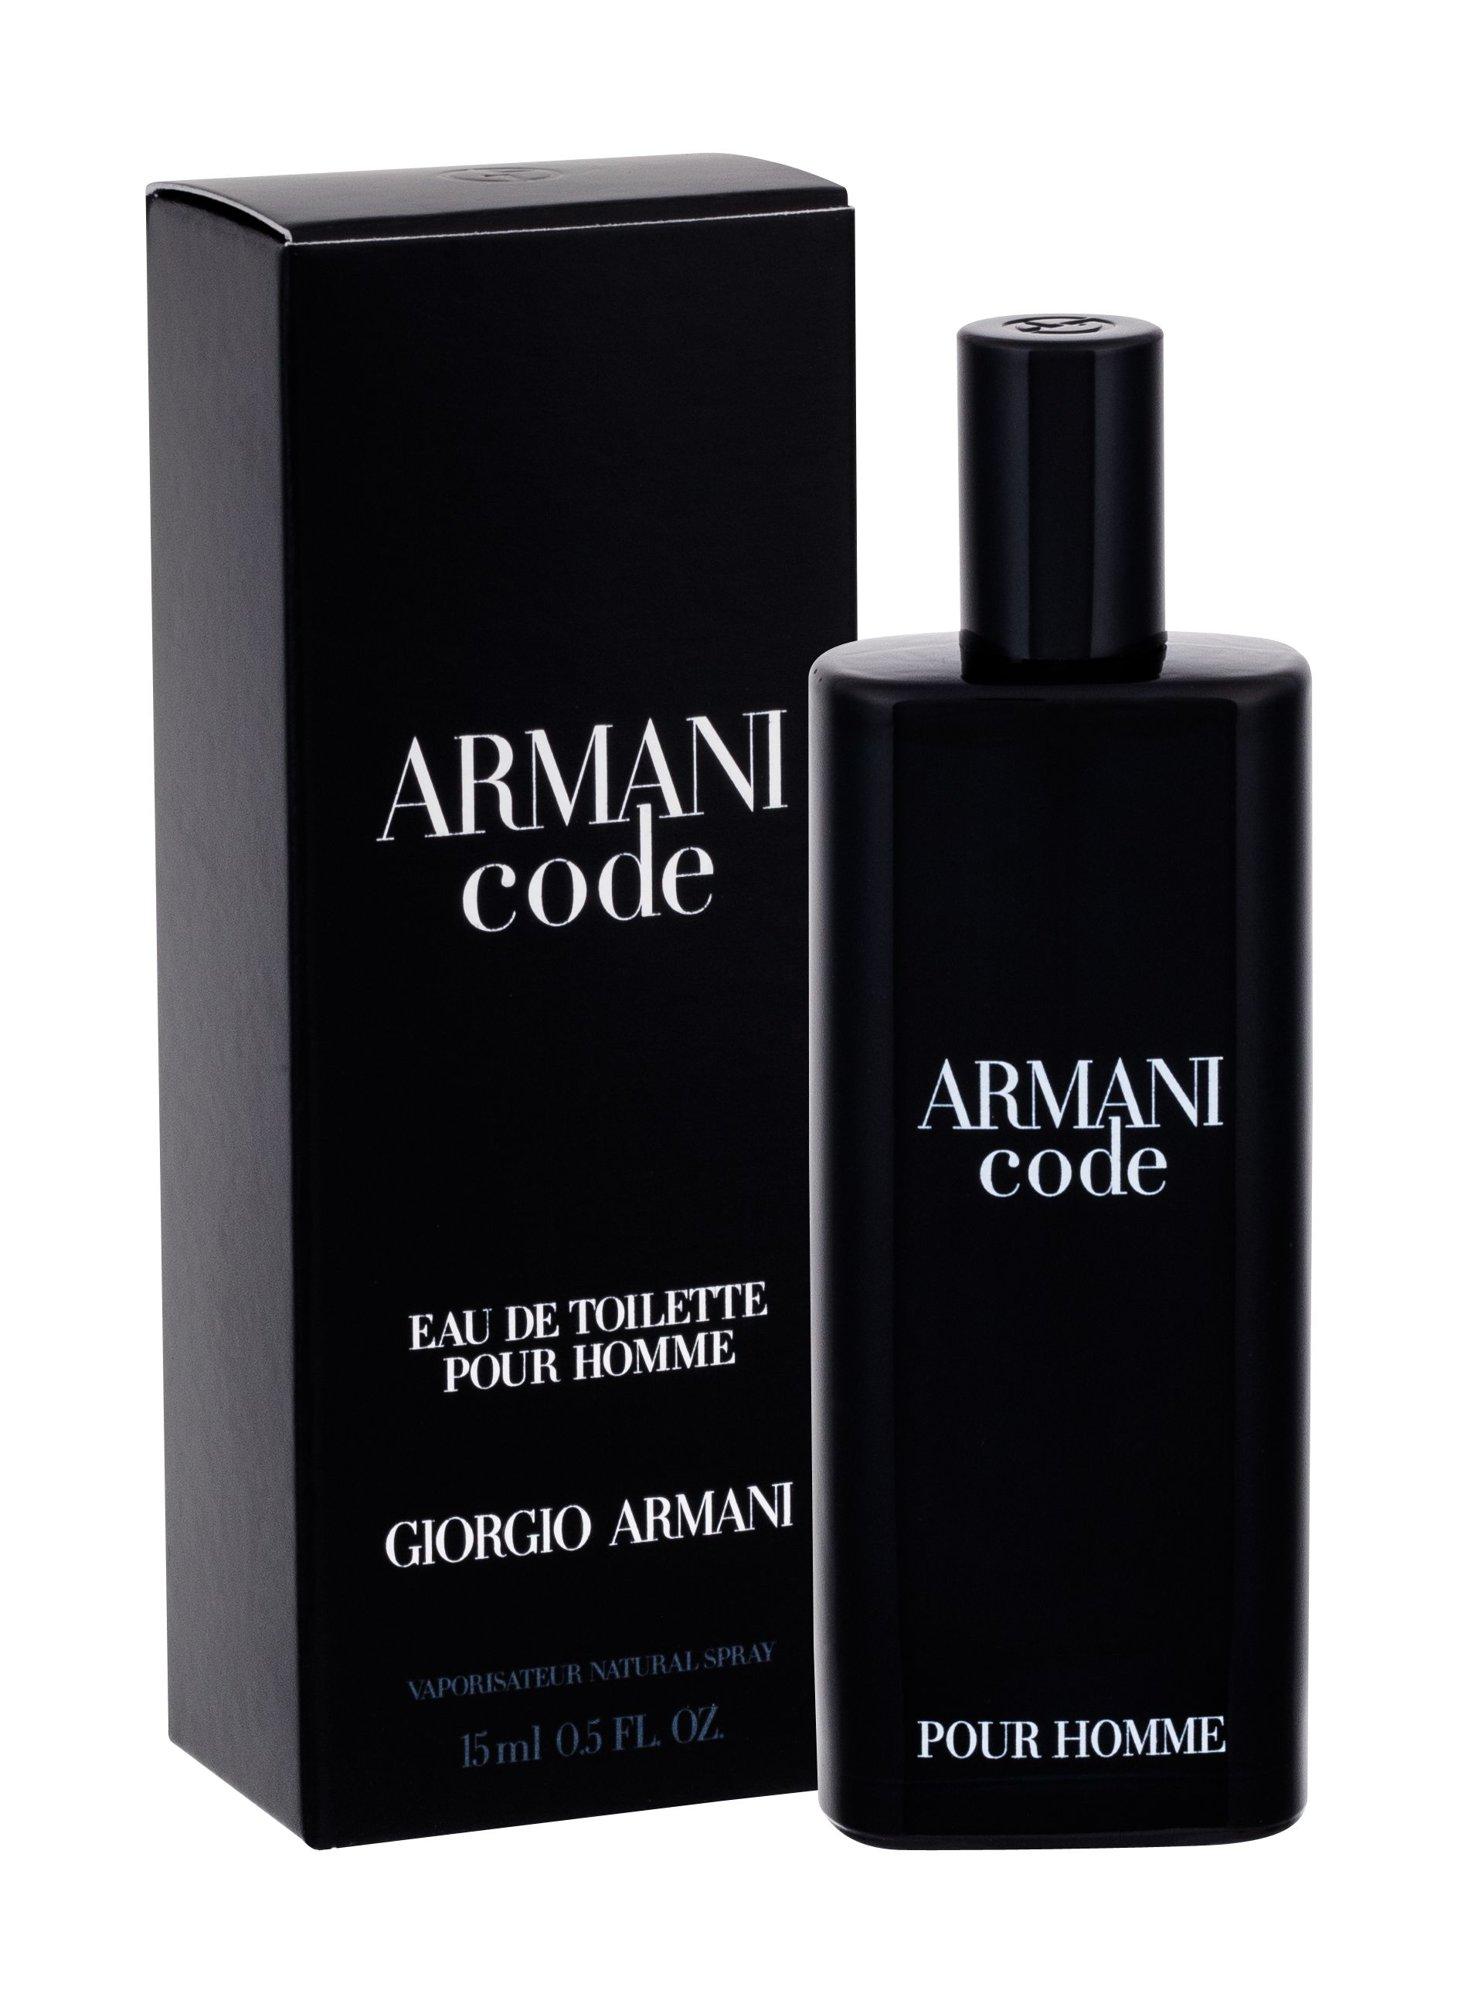 Giorgio Armani Armani Code Pour Homme Eau de Toilette 15ml